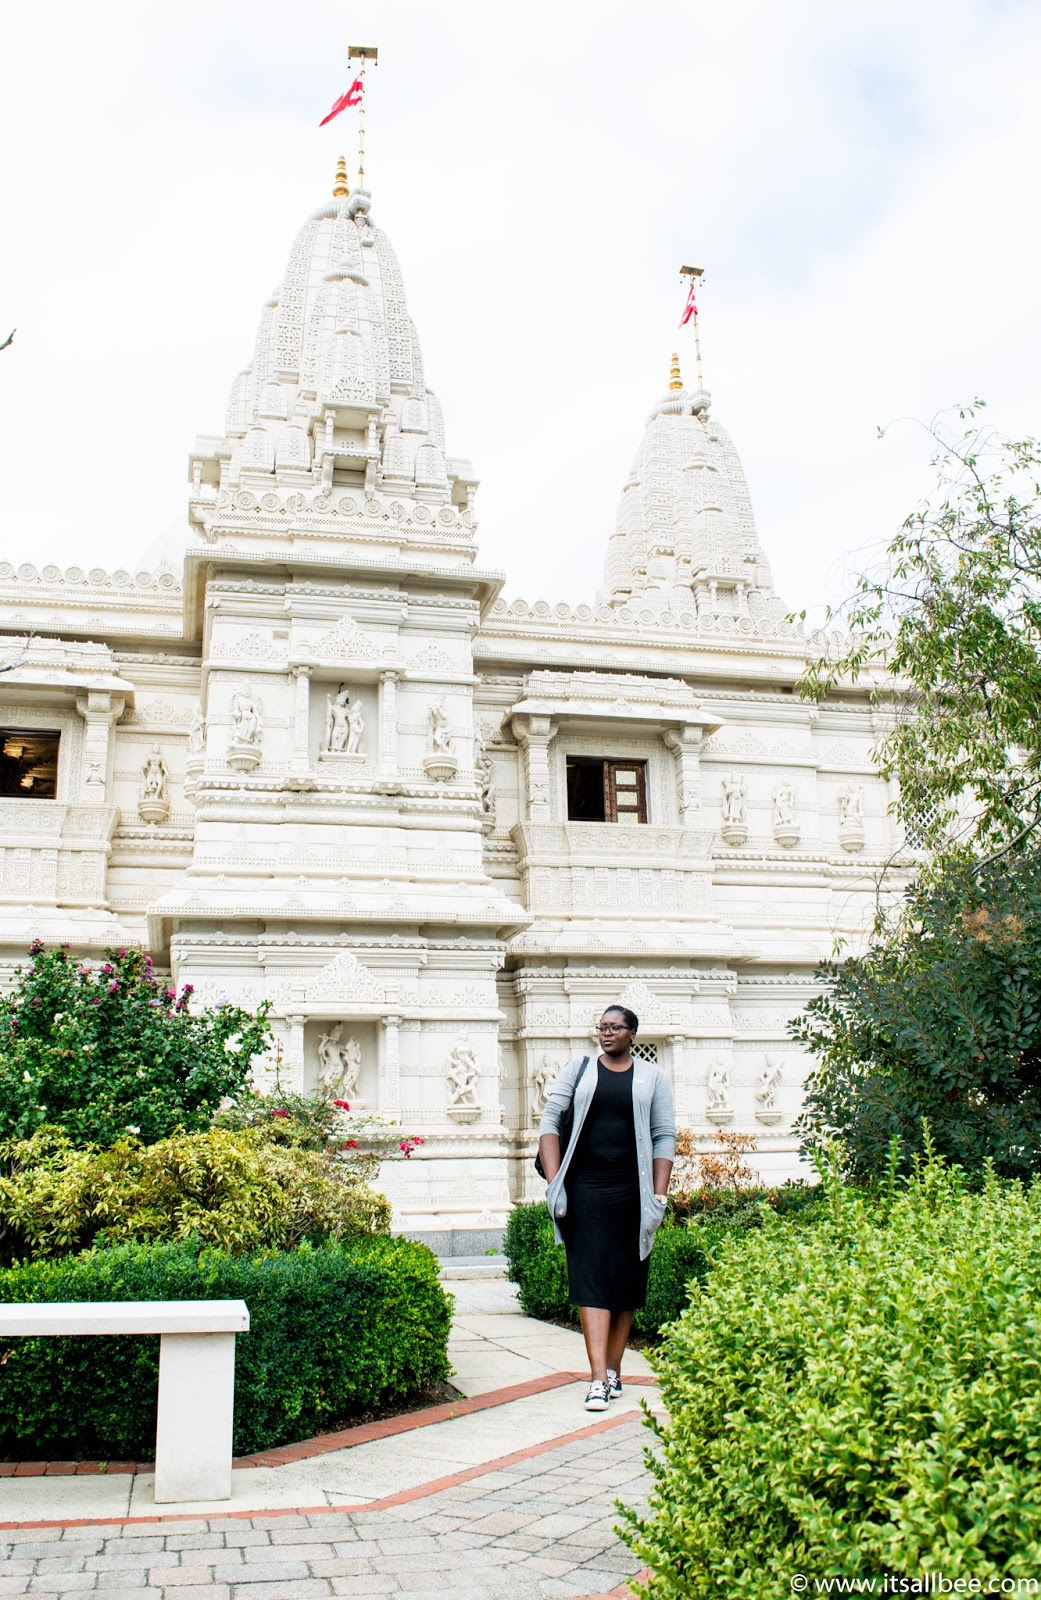 Neasden temple | Baps Shri-Swaninarayan Mandir